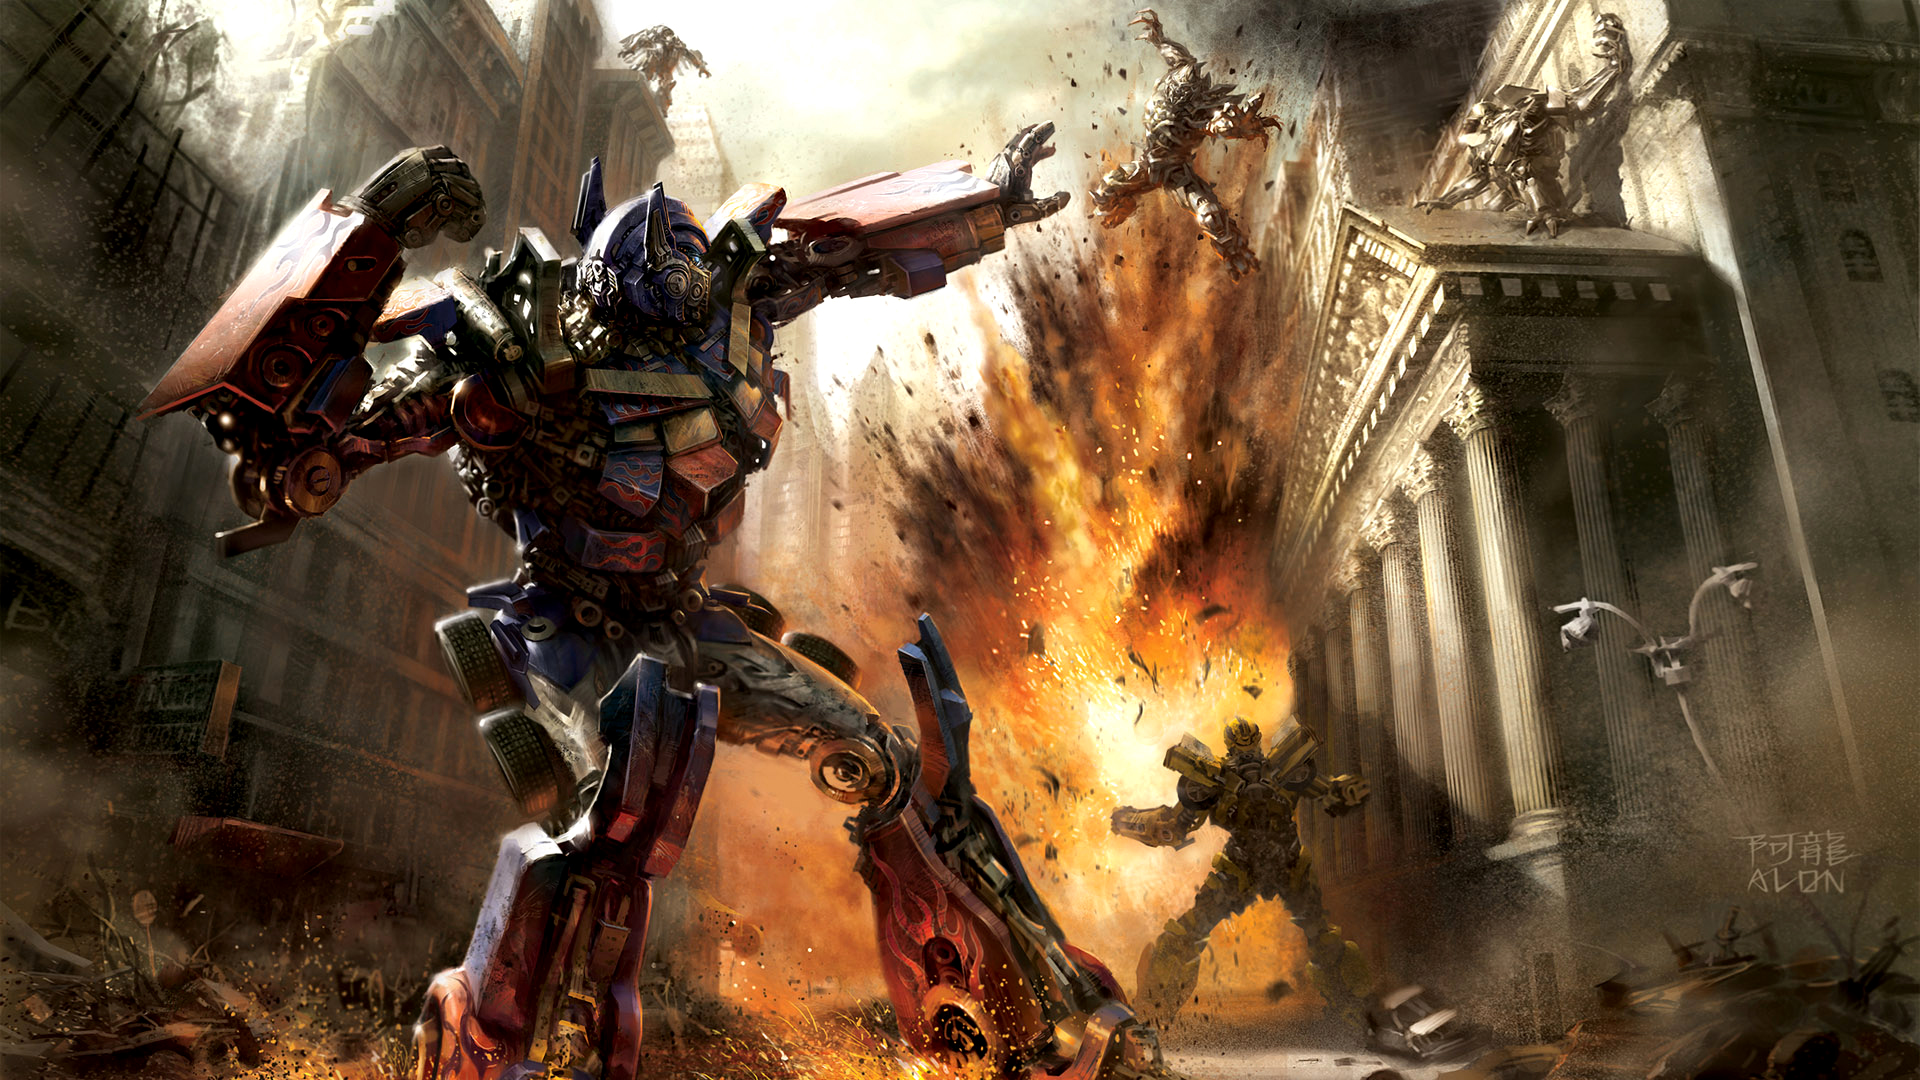 49 Transformers Hd Wallpapers 1080p On Wallpapersafari